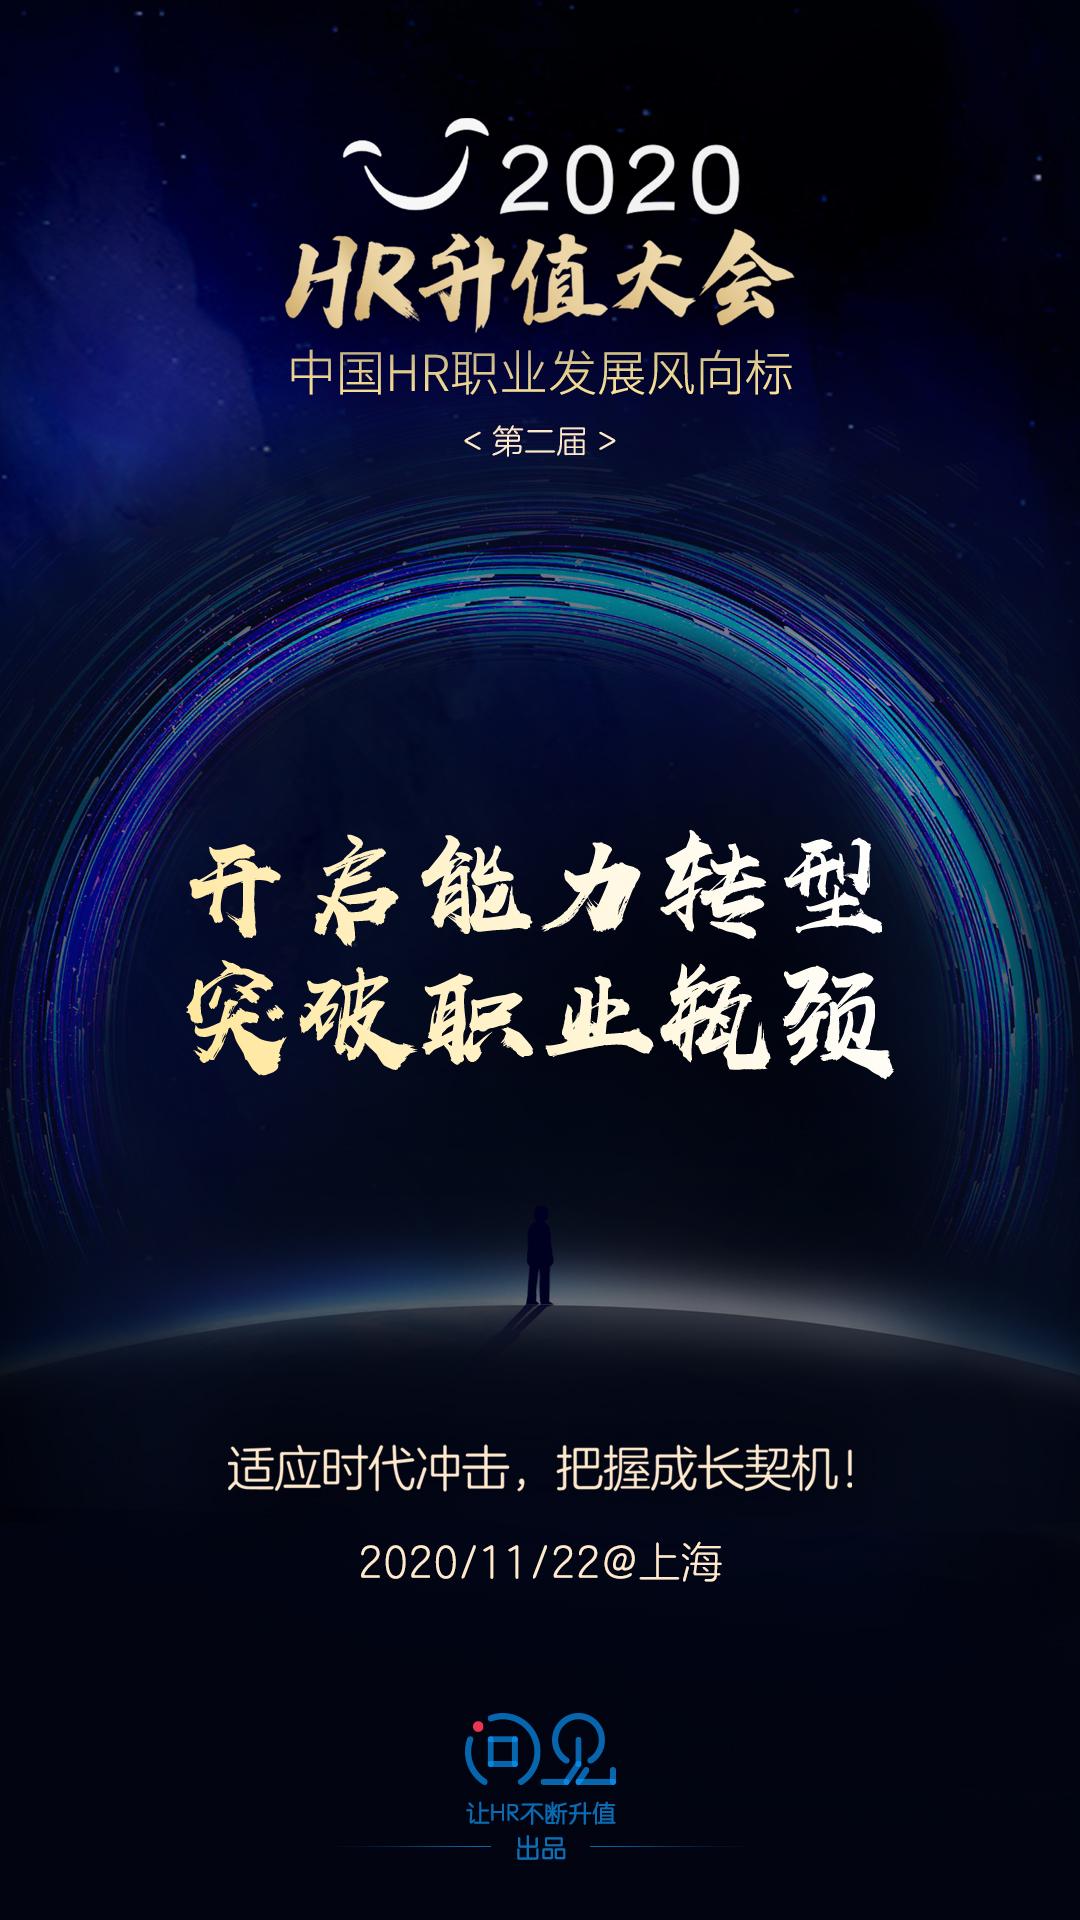 《HR升值大会》——中国HR职业发展风向标会议